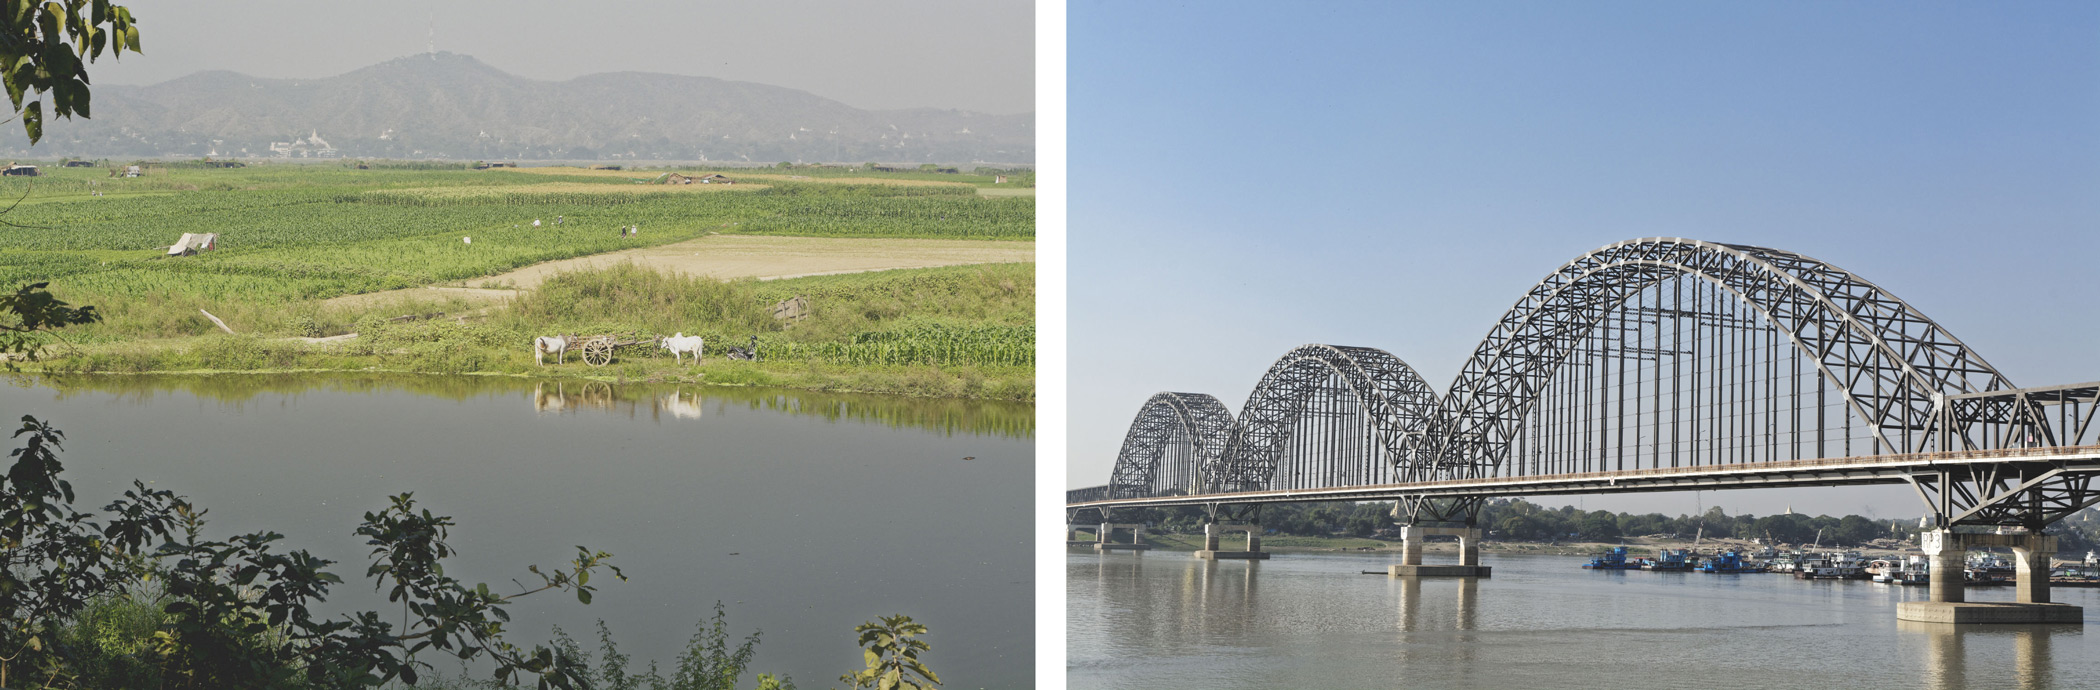 Campagne autour de Mandalay